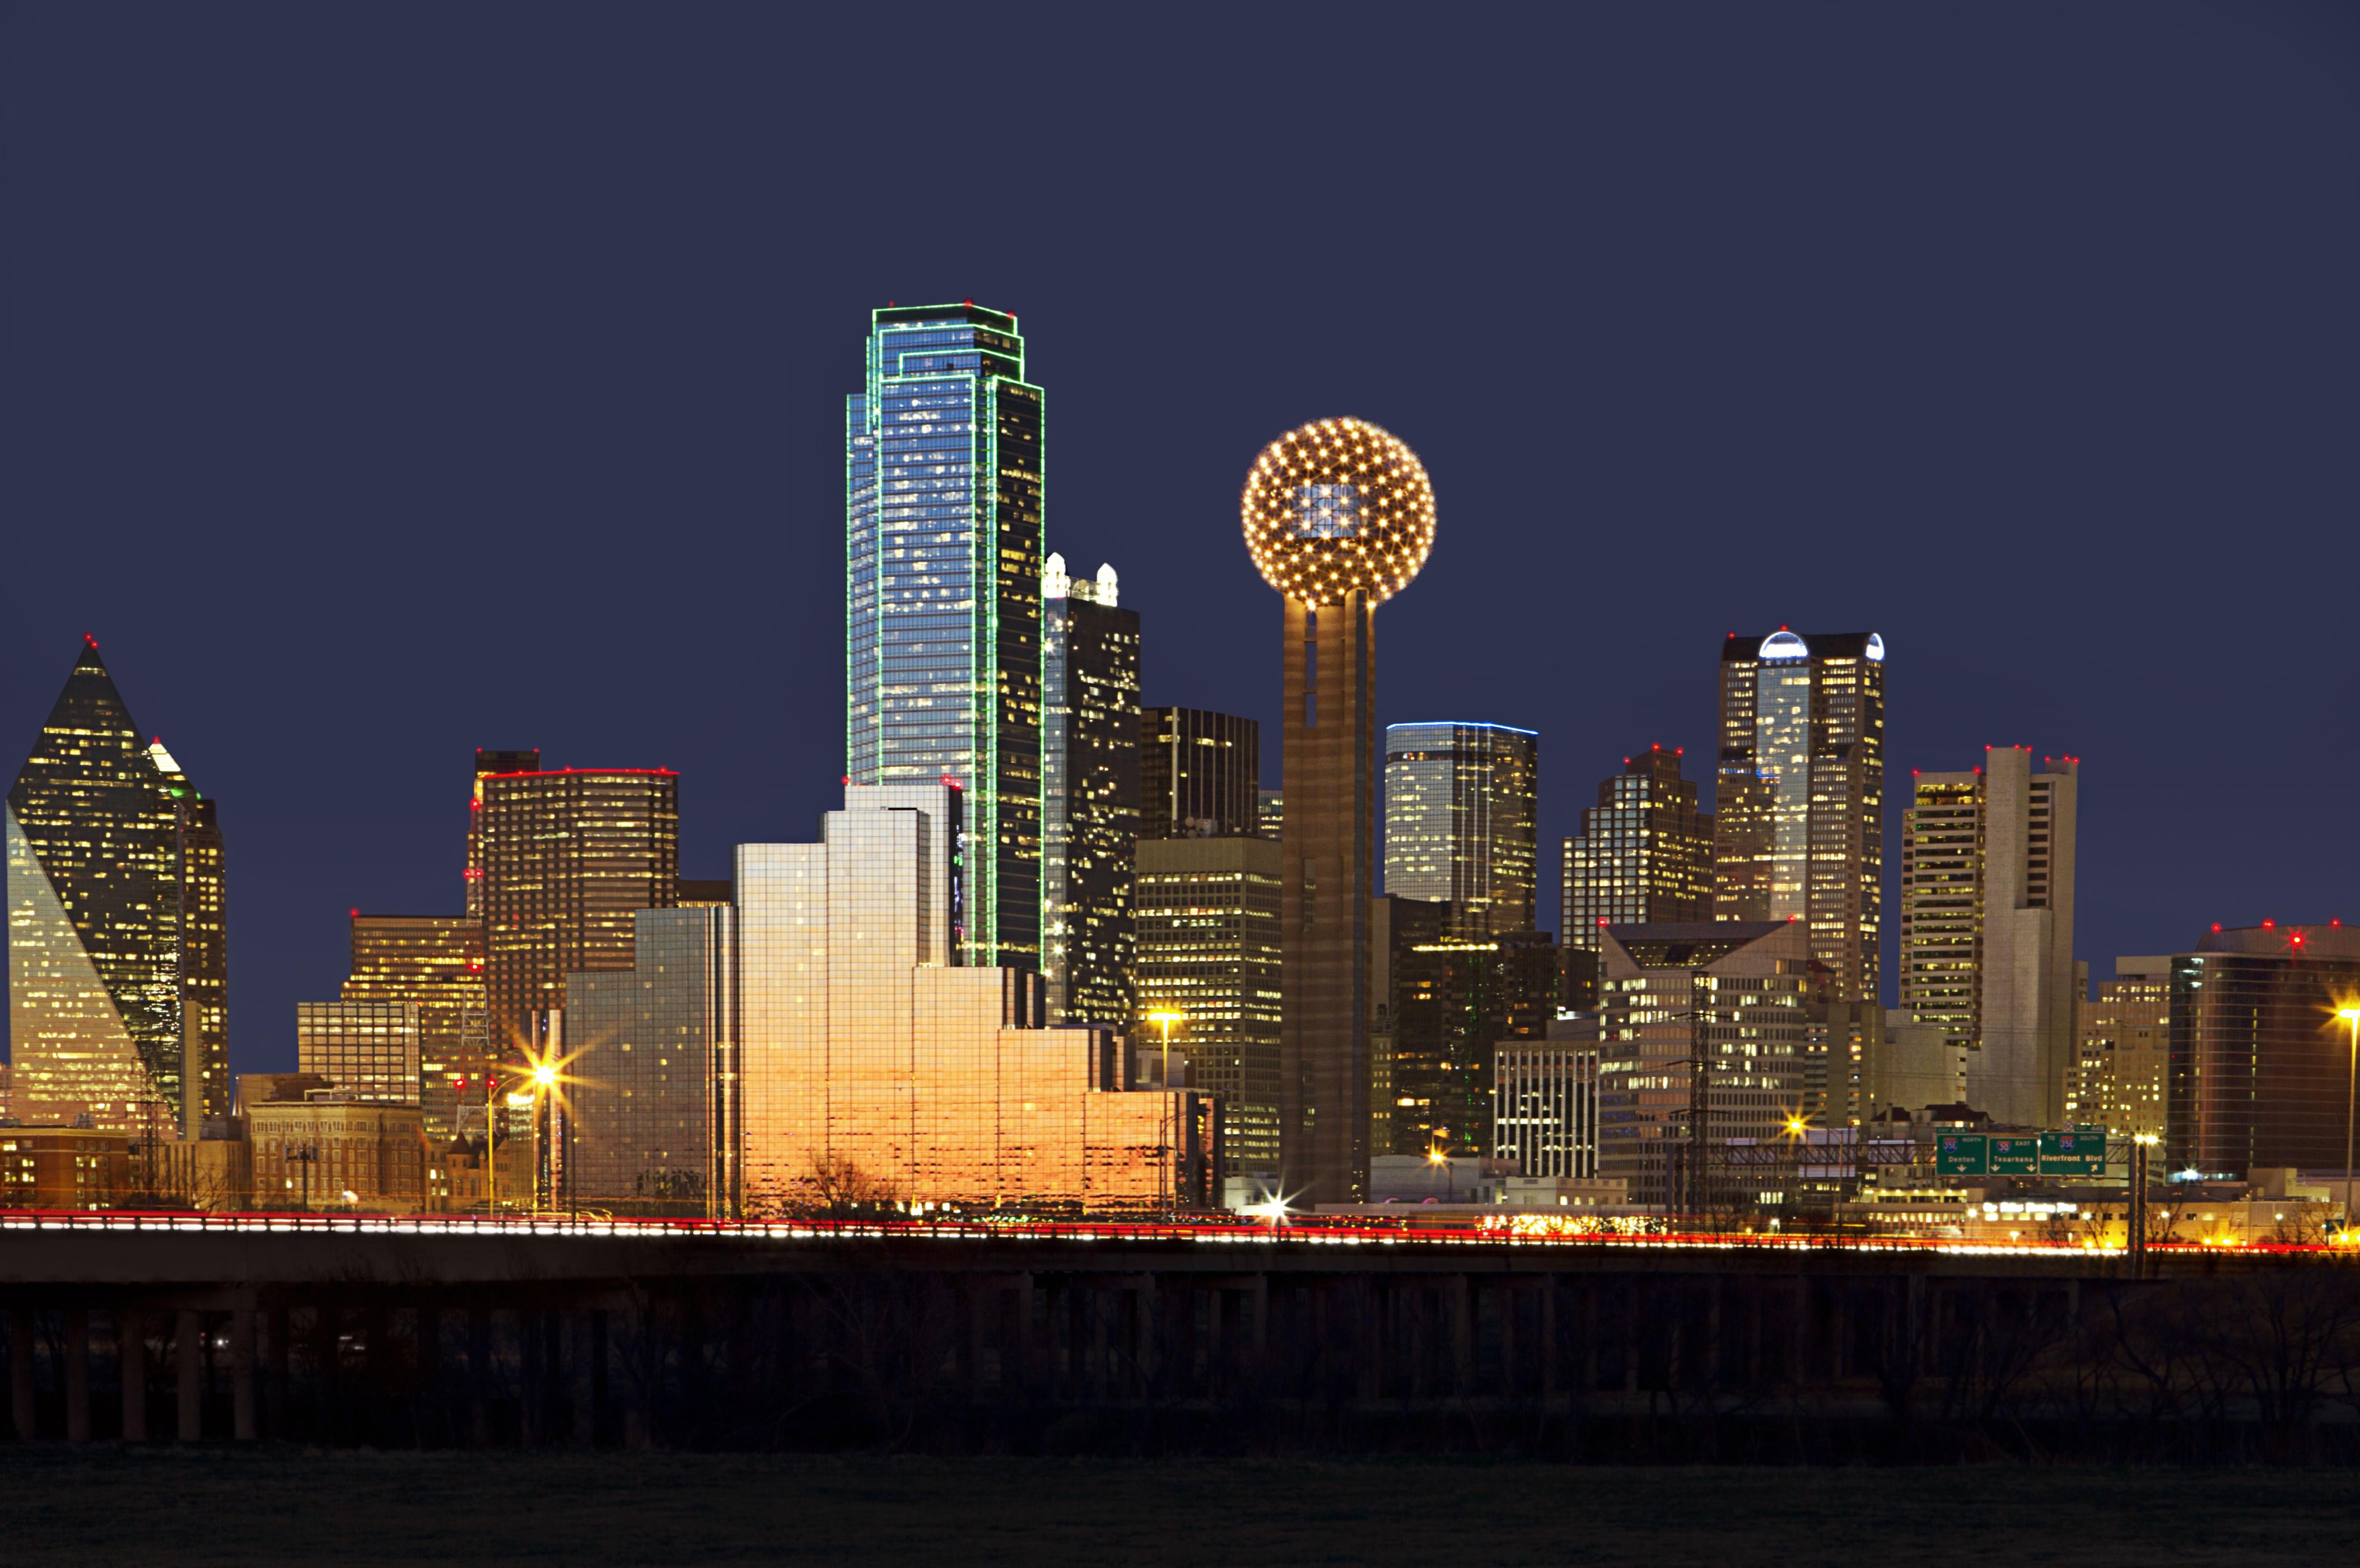 Dallas To Attract Major Events